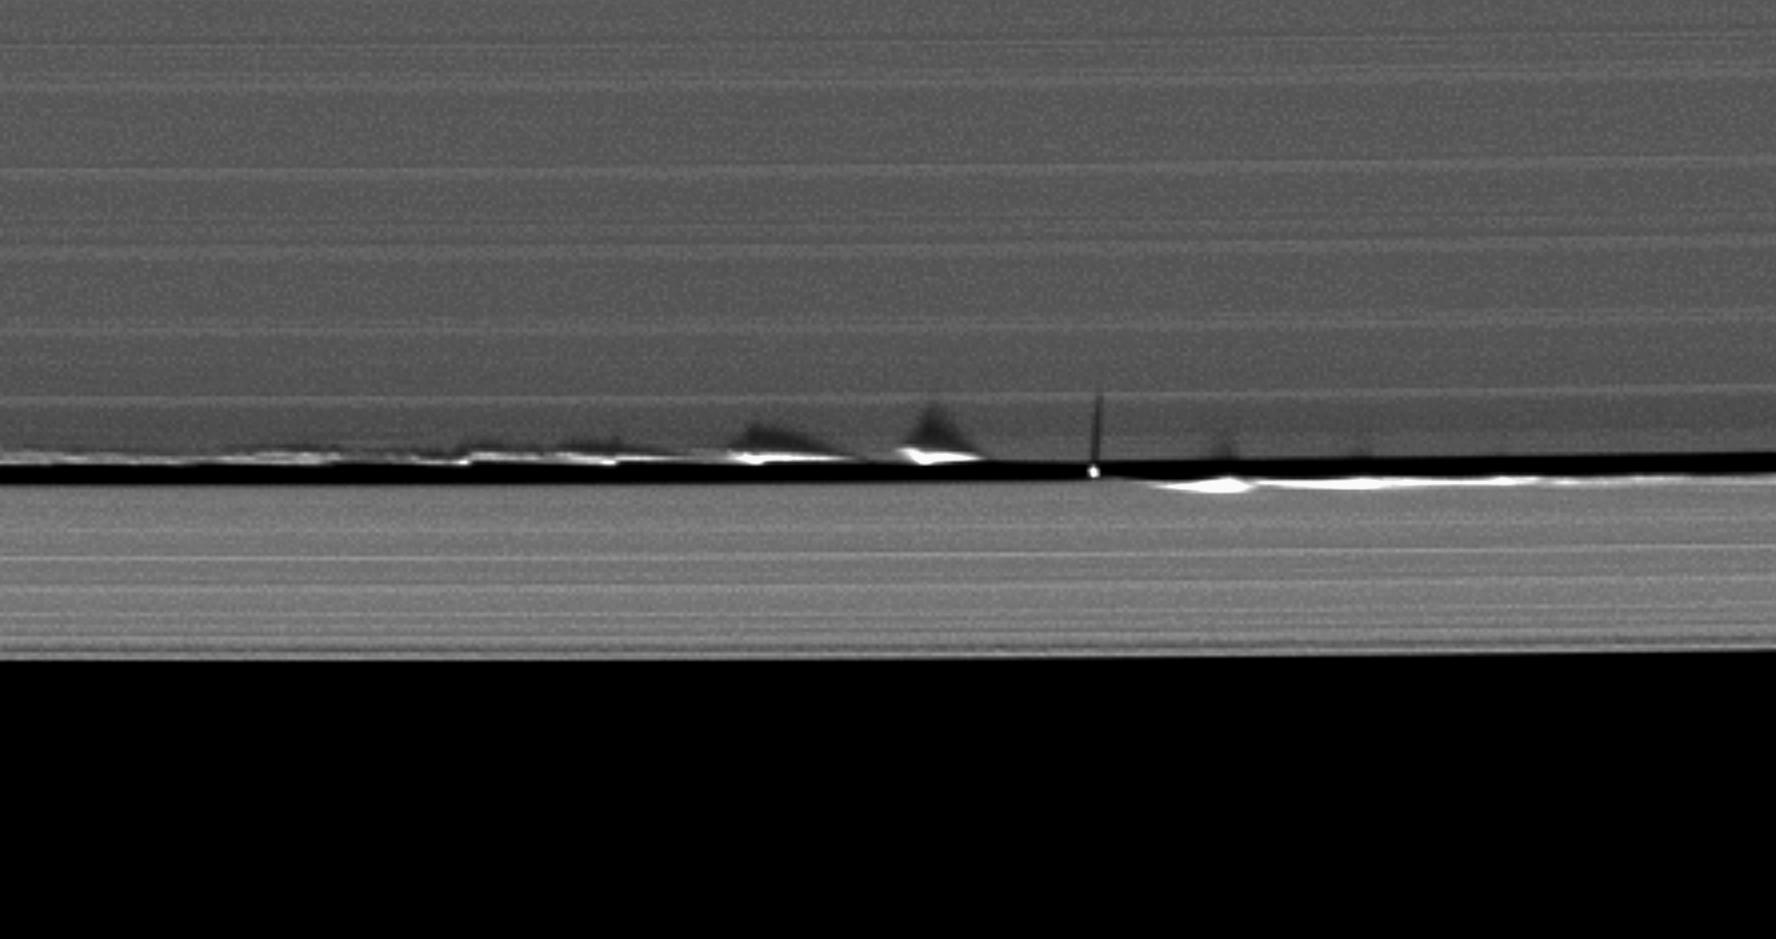 cassini saturn rings close up - photo #30